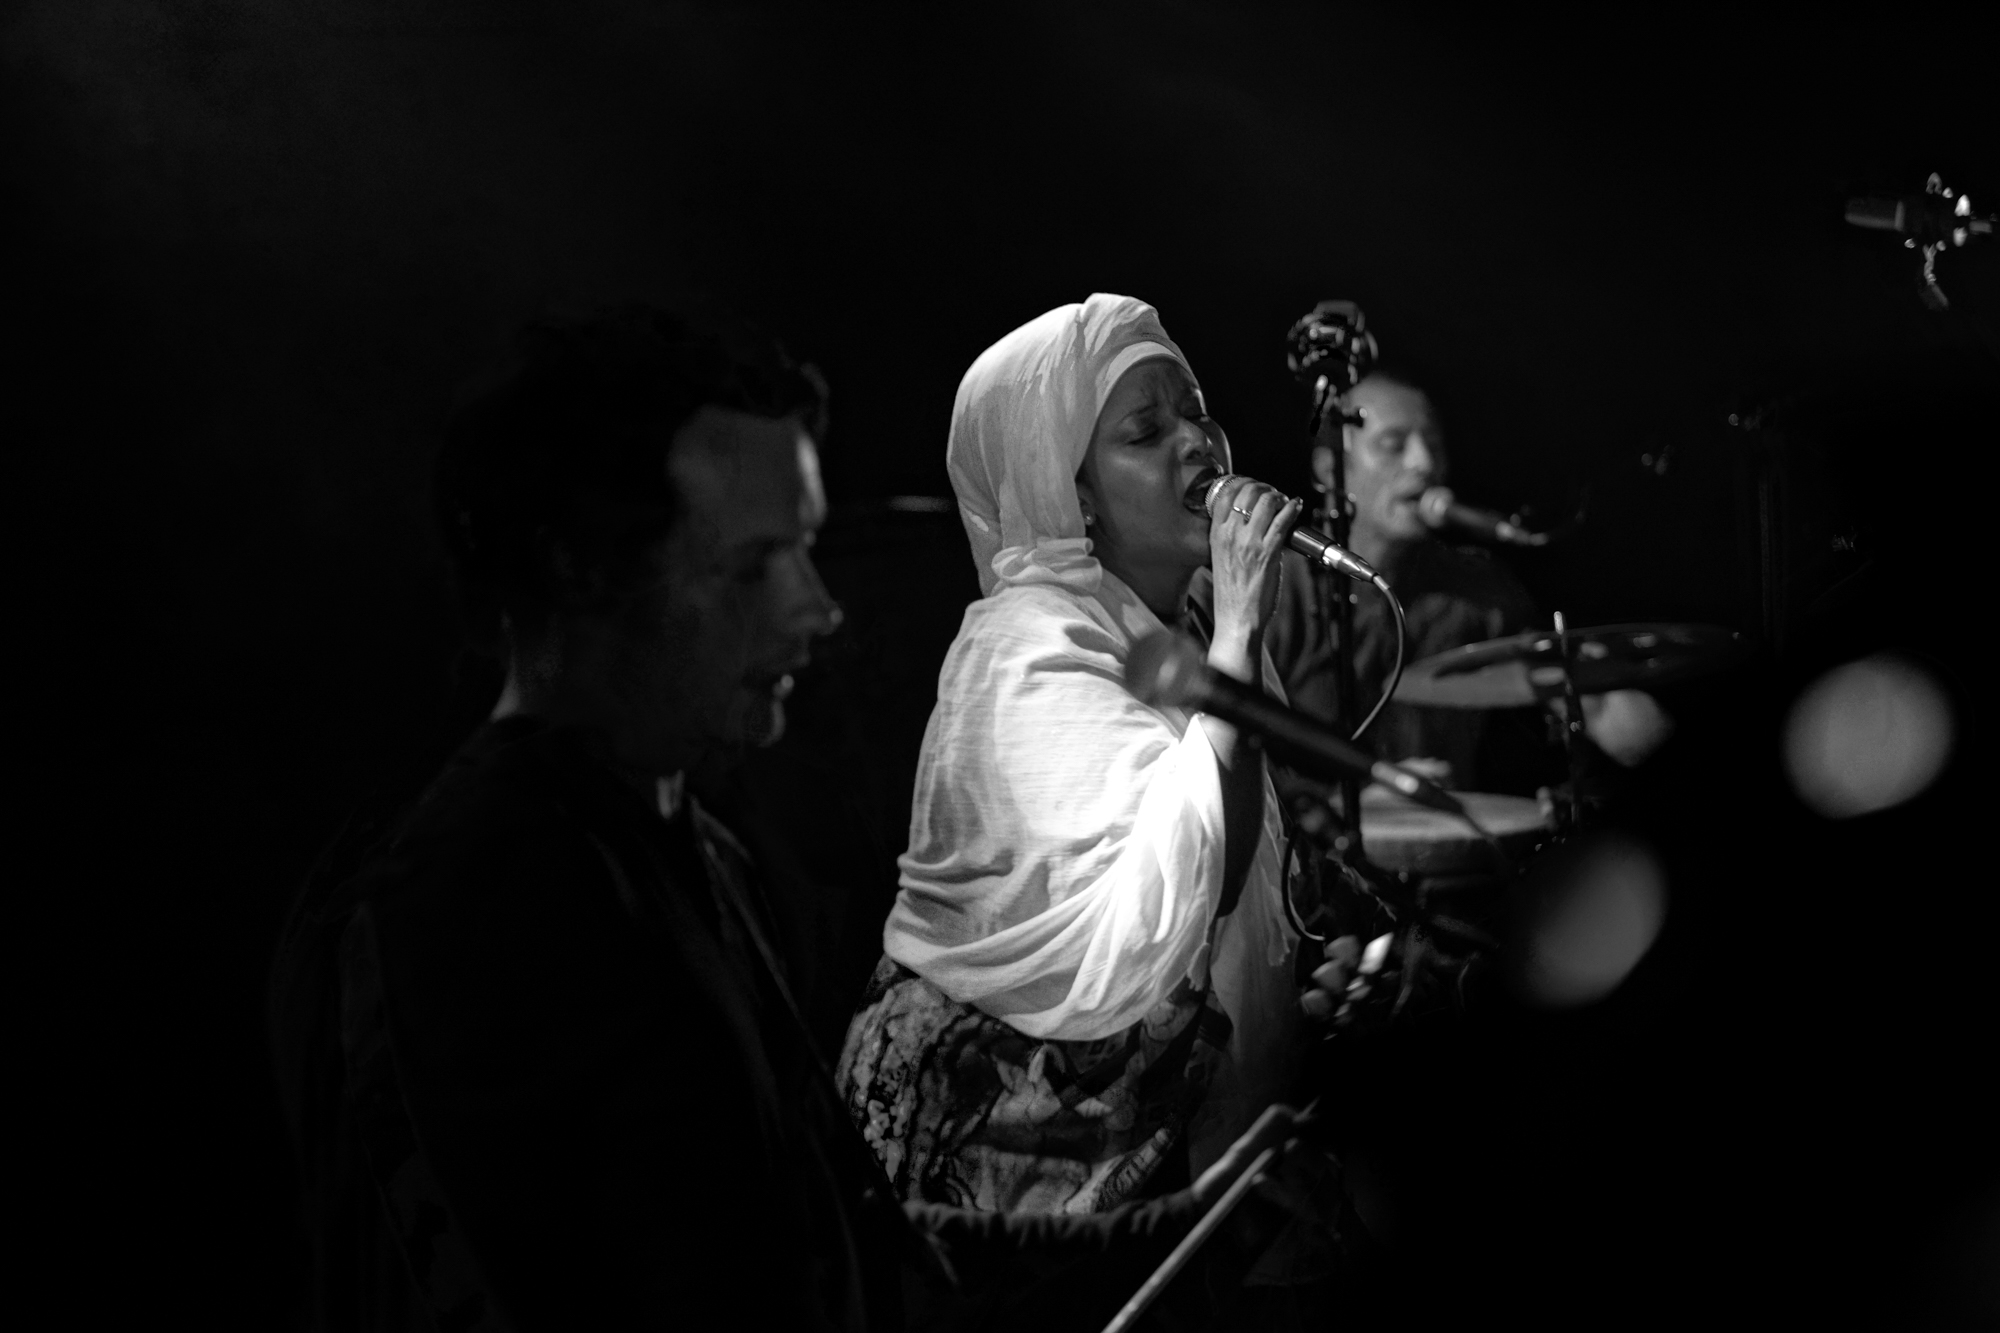 Les Filles de Illighadad+ Sahra Halgan [La Bobine] 16/11